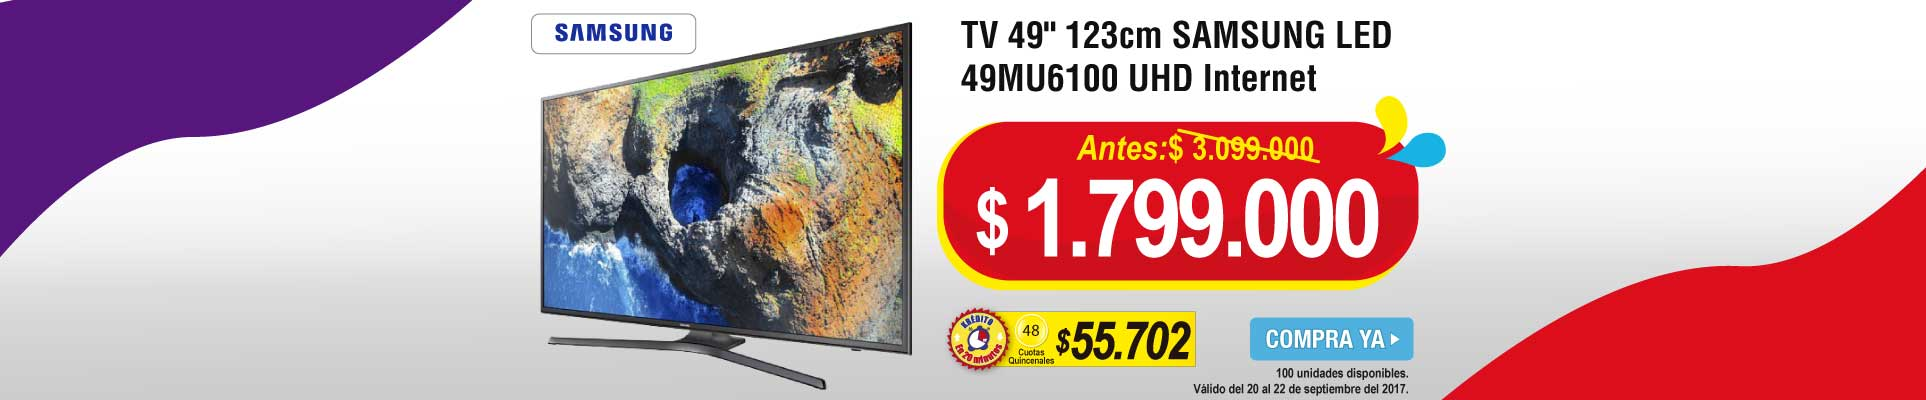 TV 49 123cm SAMSUNG LED 49MU6100 UHD Internet - televisores